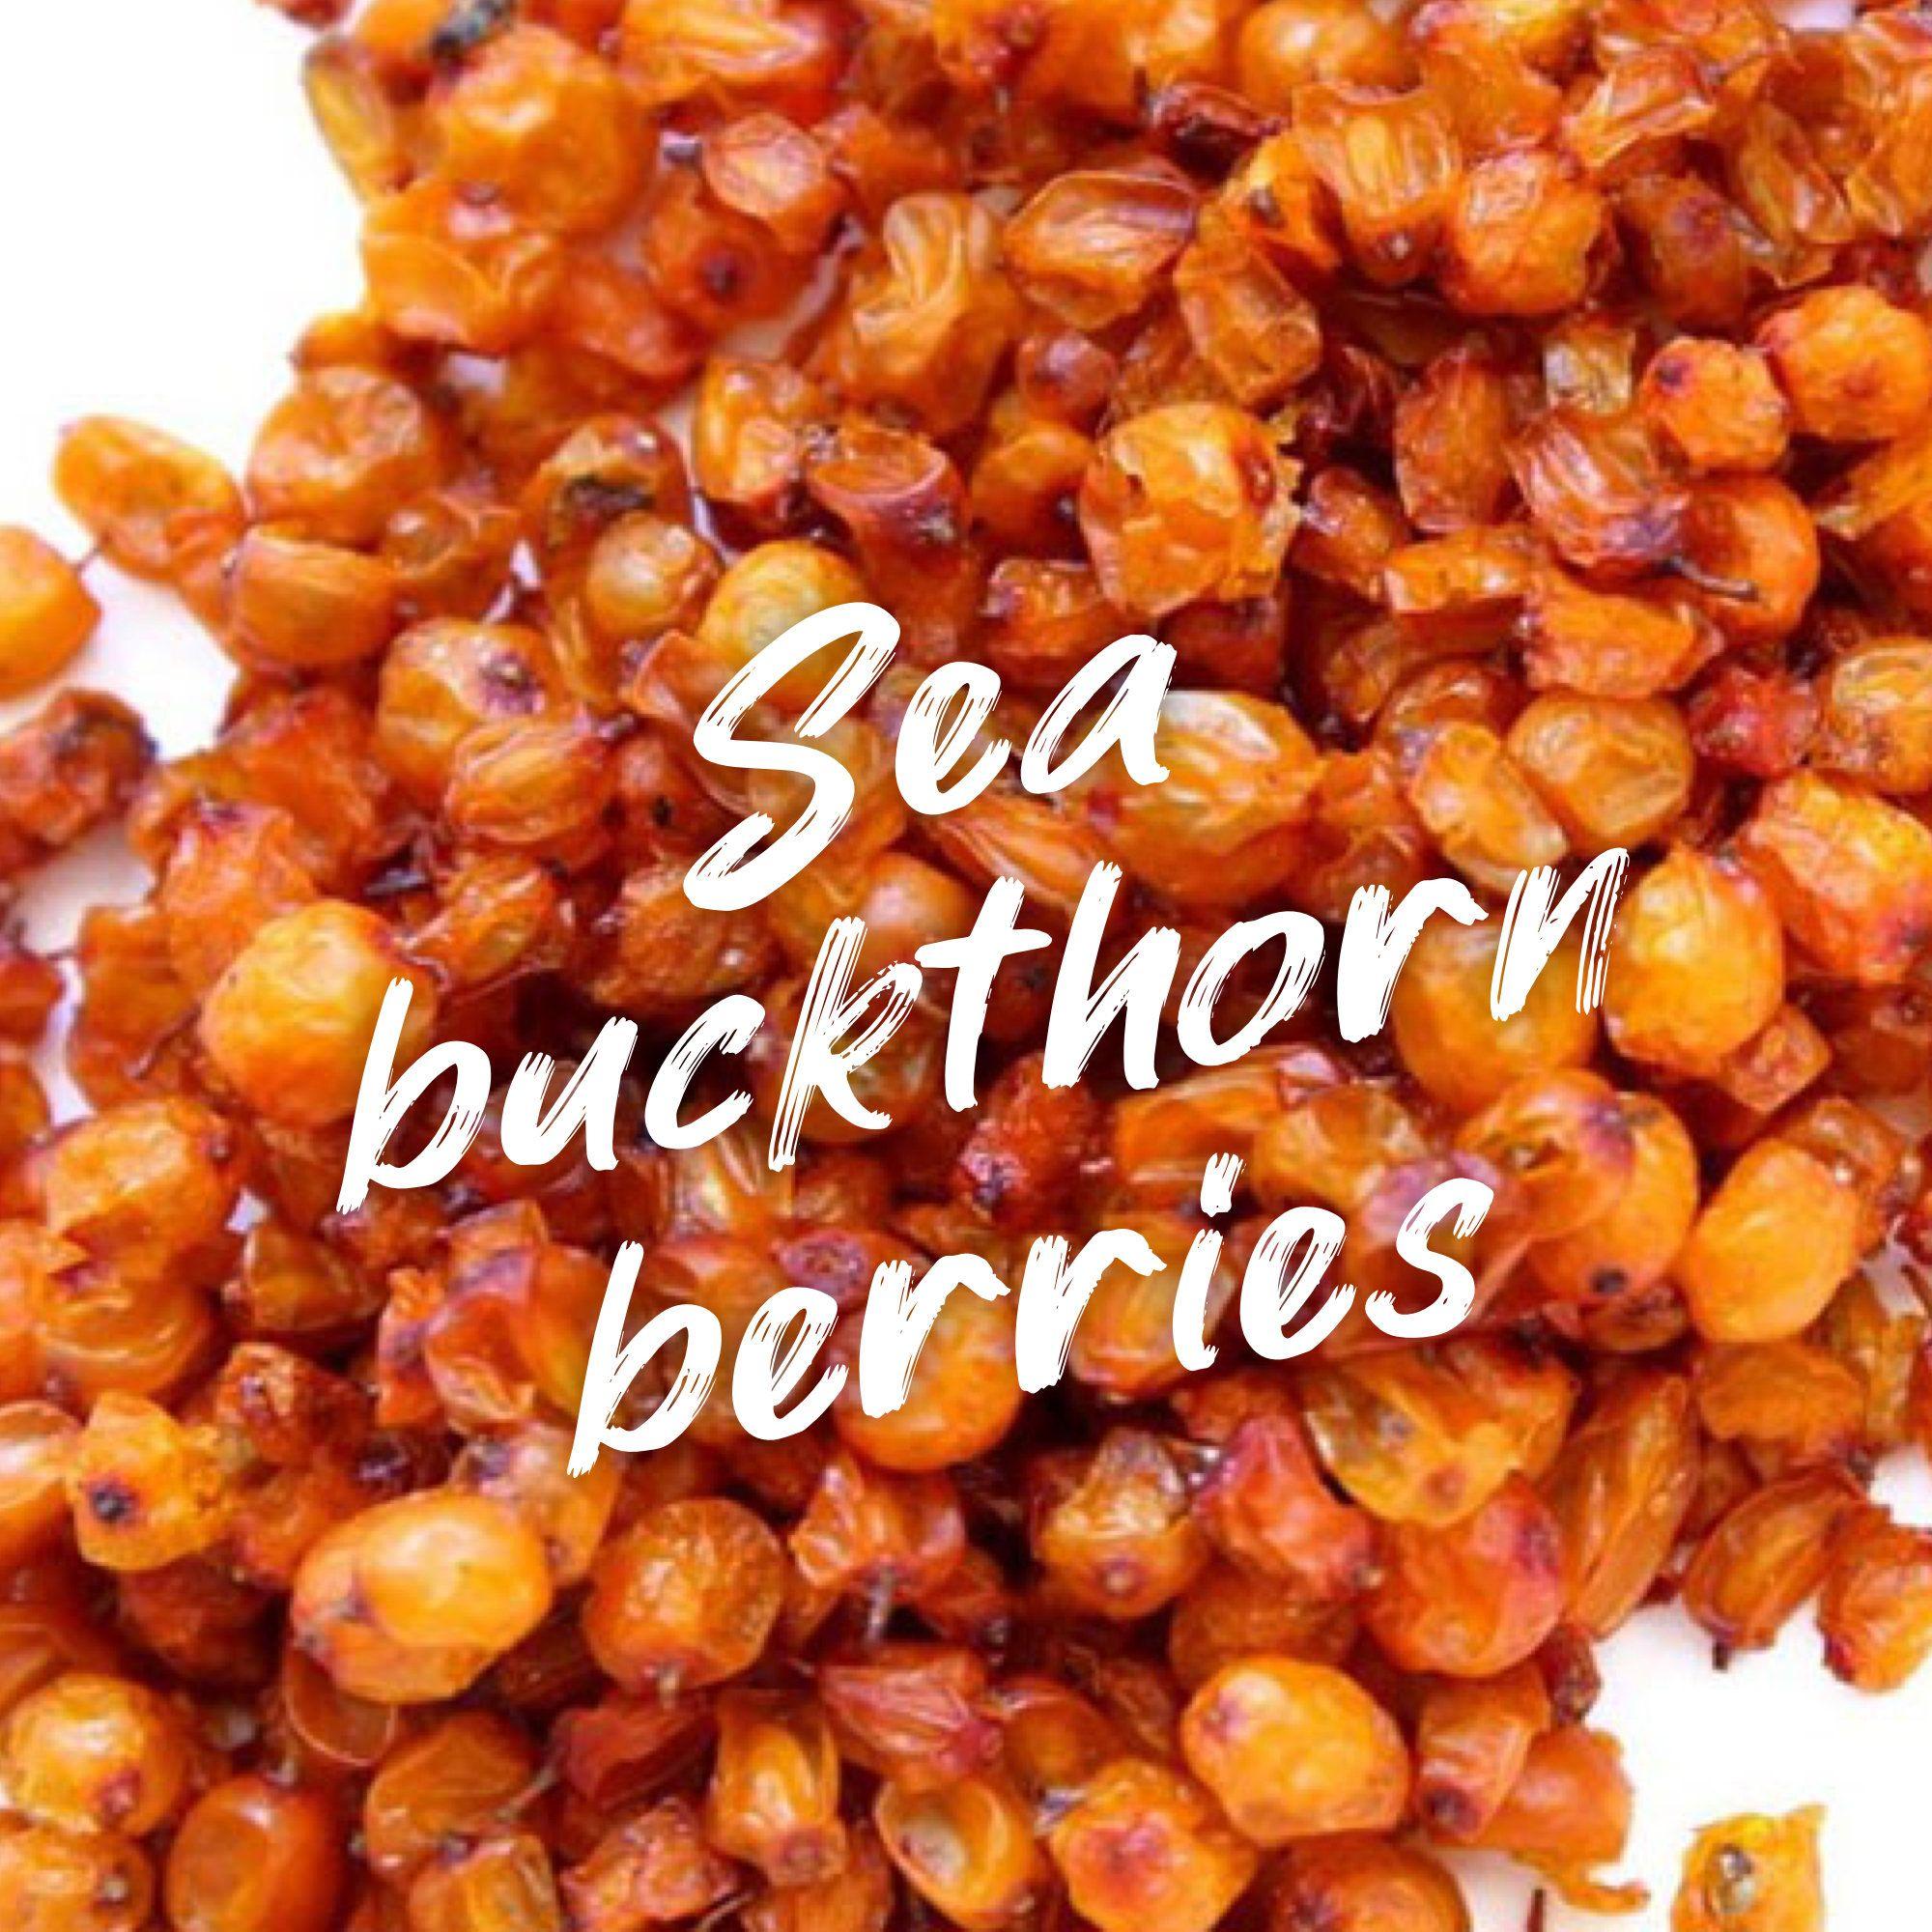 Sea Buckthorn Berries, Hippophae, Seaberry, Organic Natural Herb, Herbal Tea by MaizeOrganics on Etsy